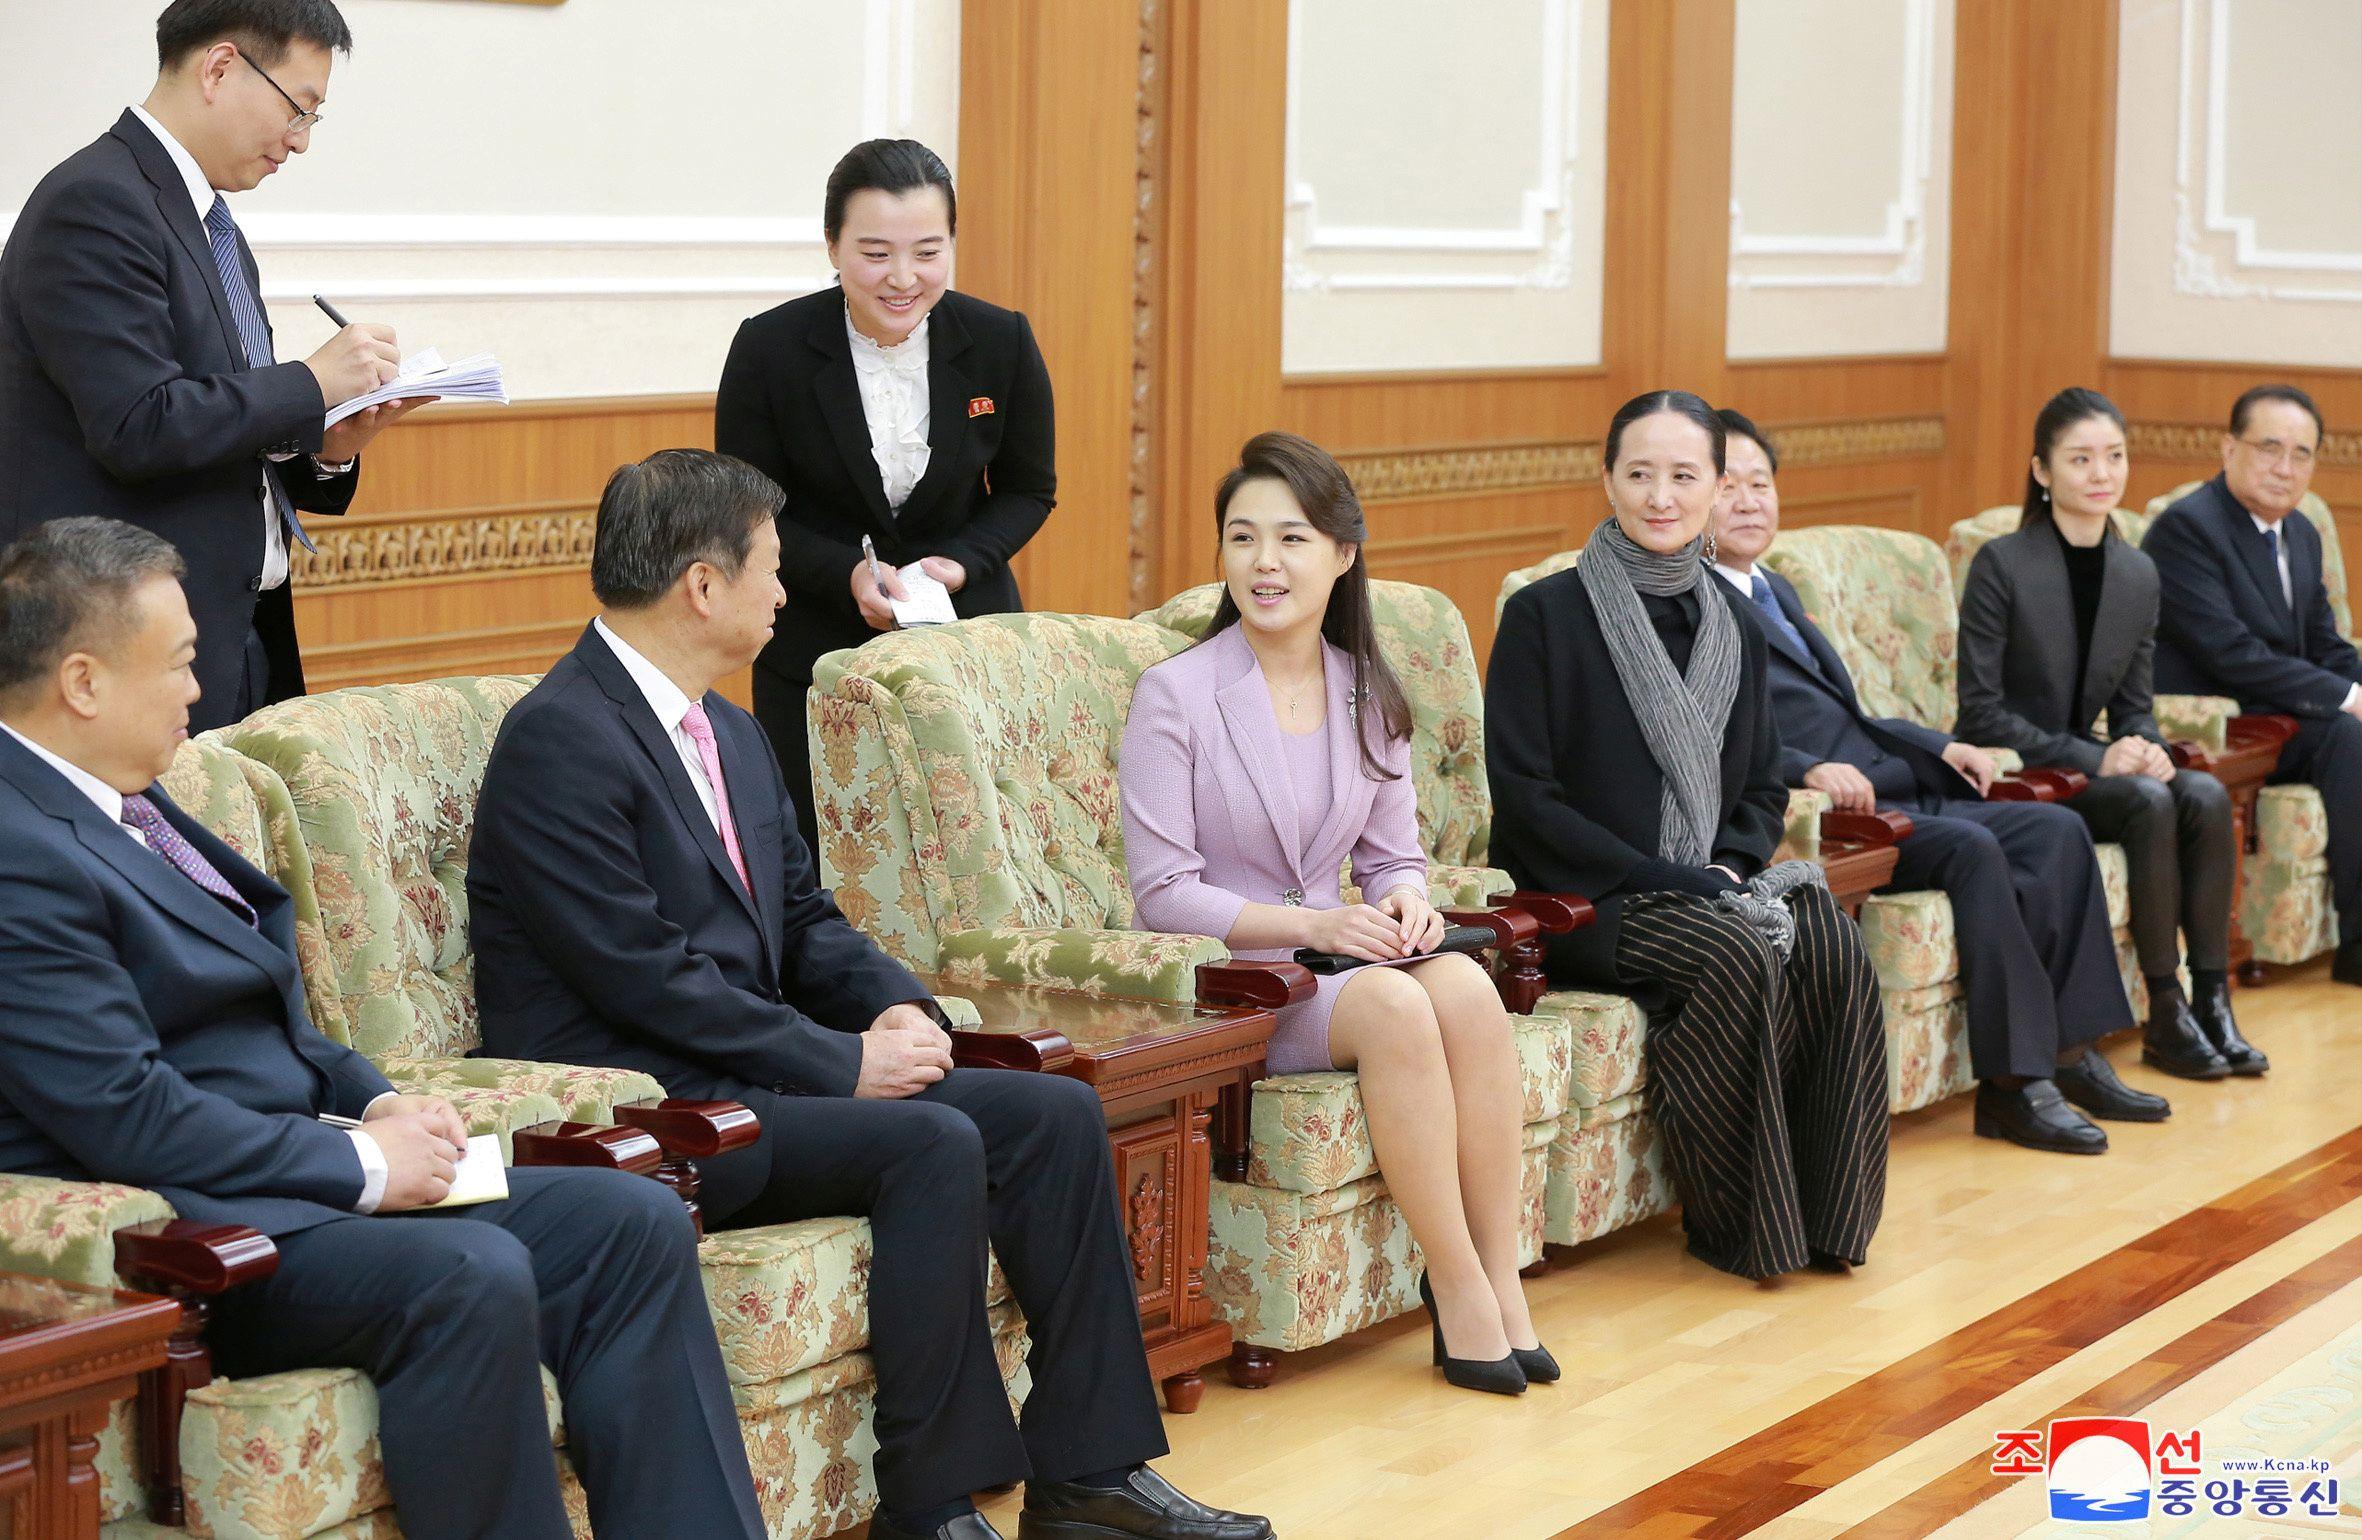 First Lady of North Korea Ri S...